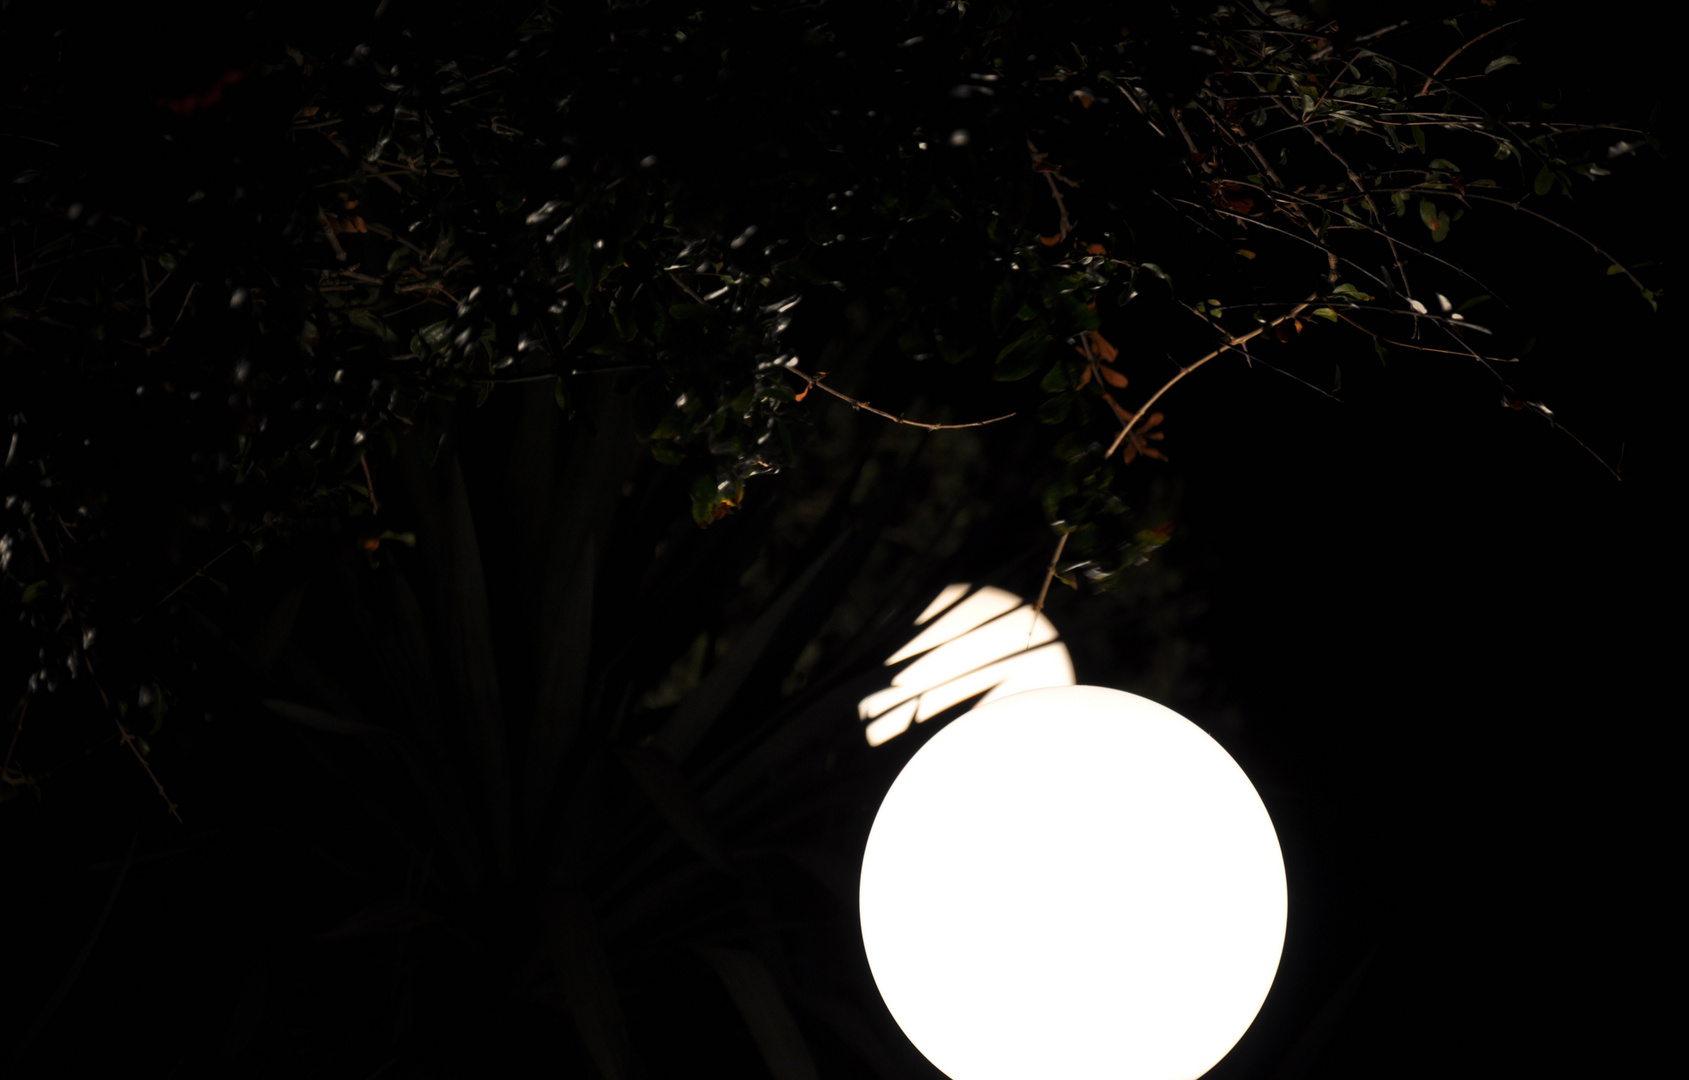 Lune in Giardino